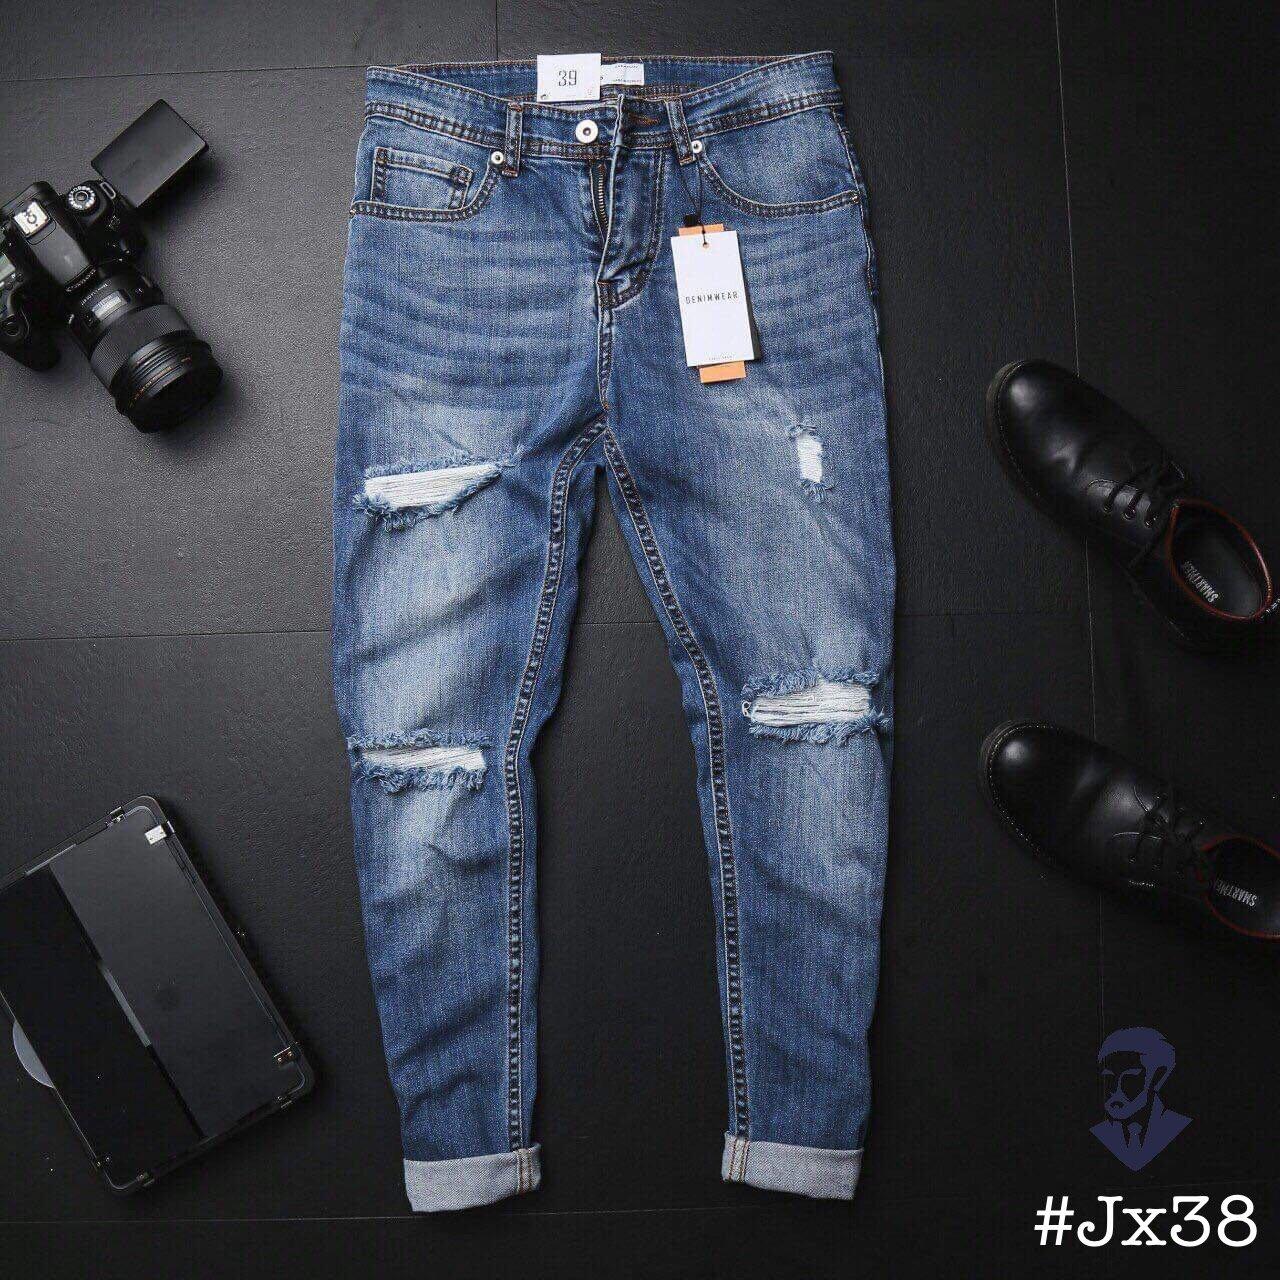 Quần Jean Jx38